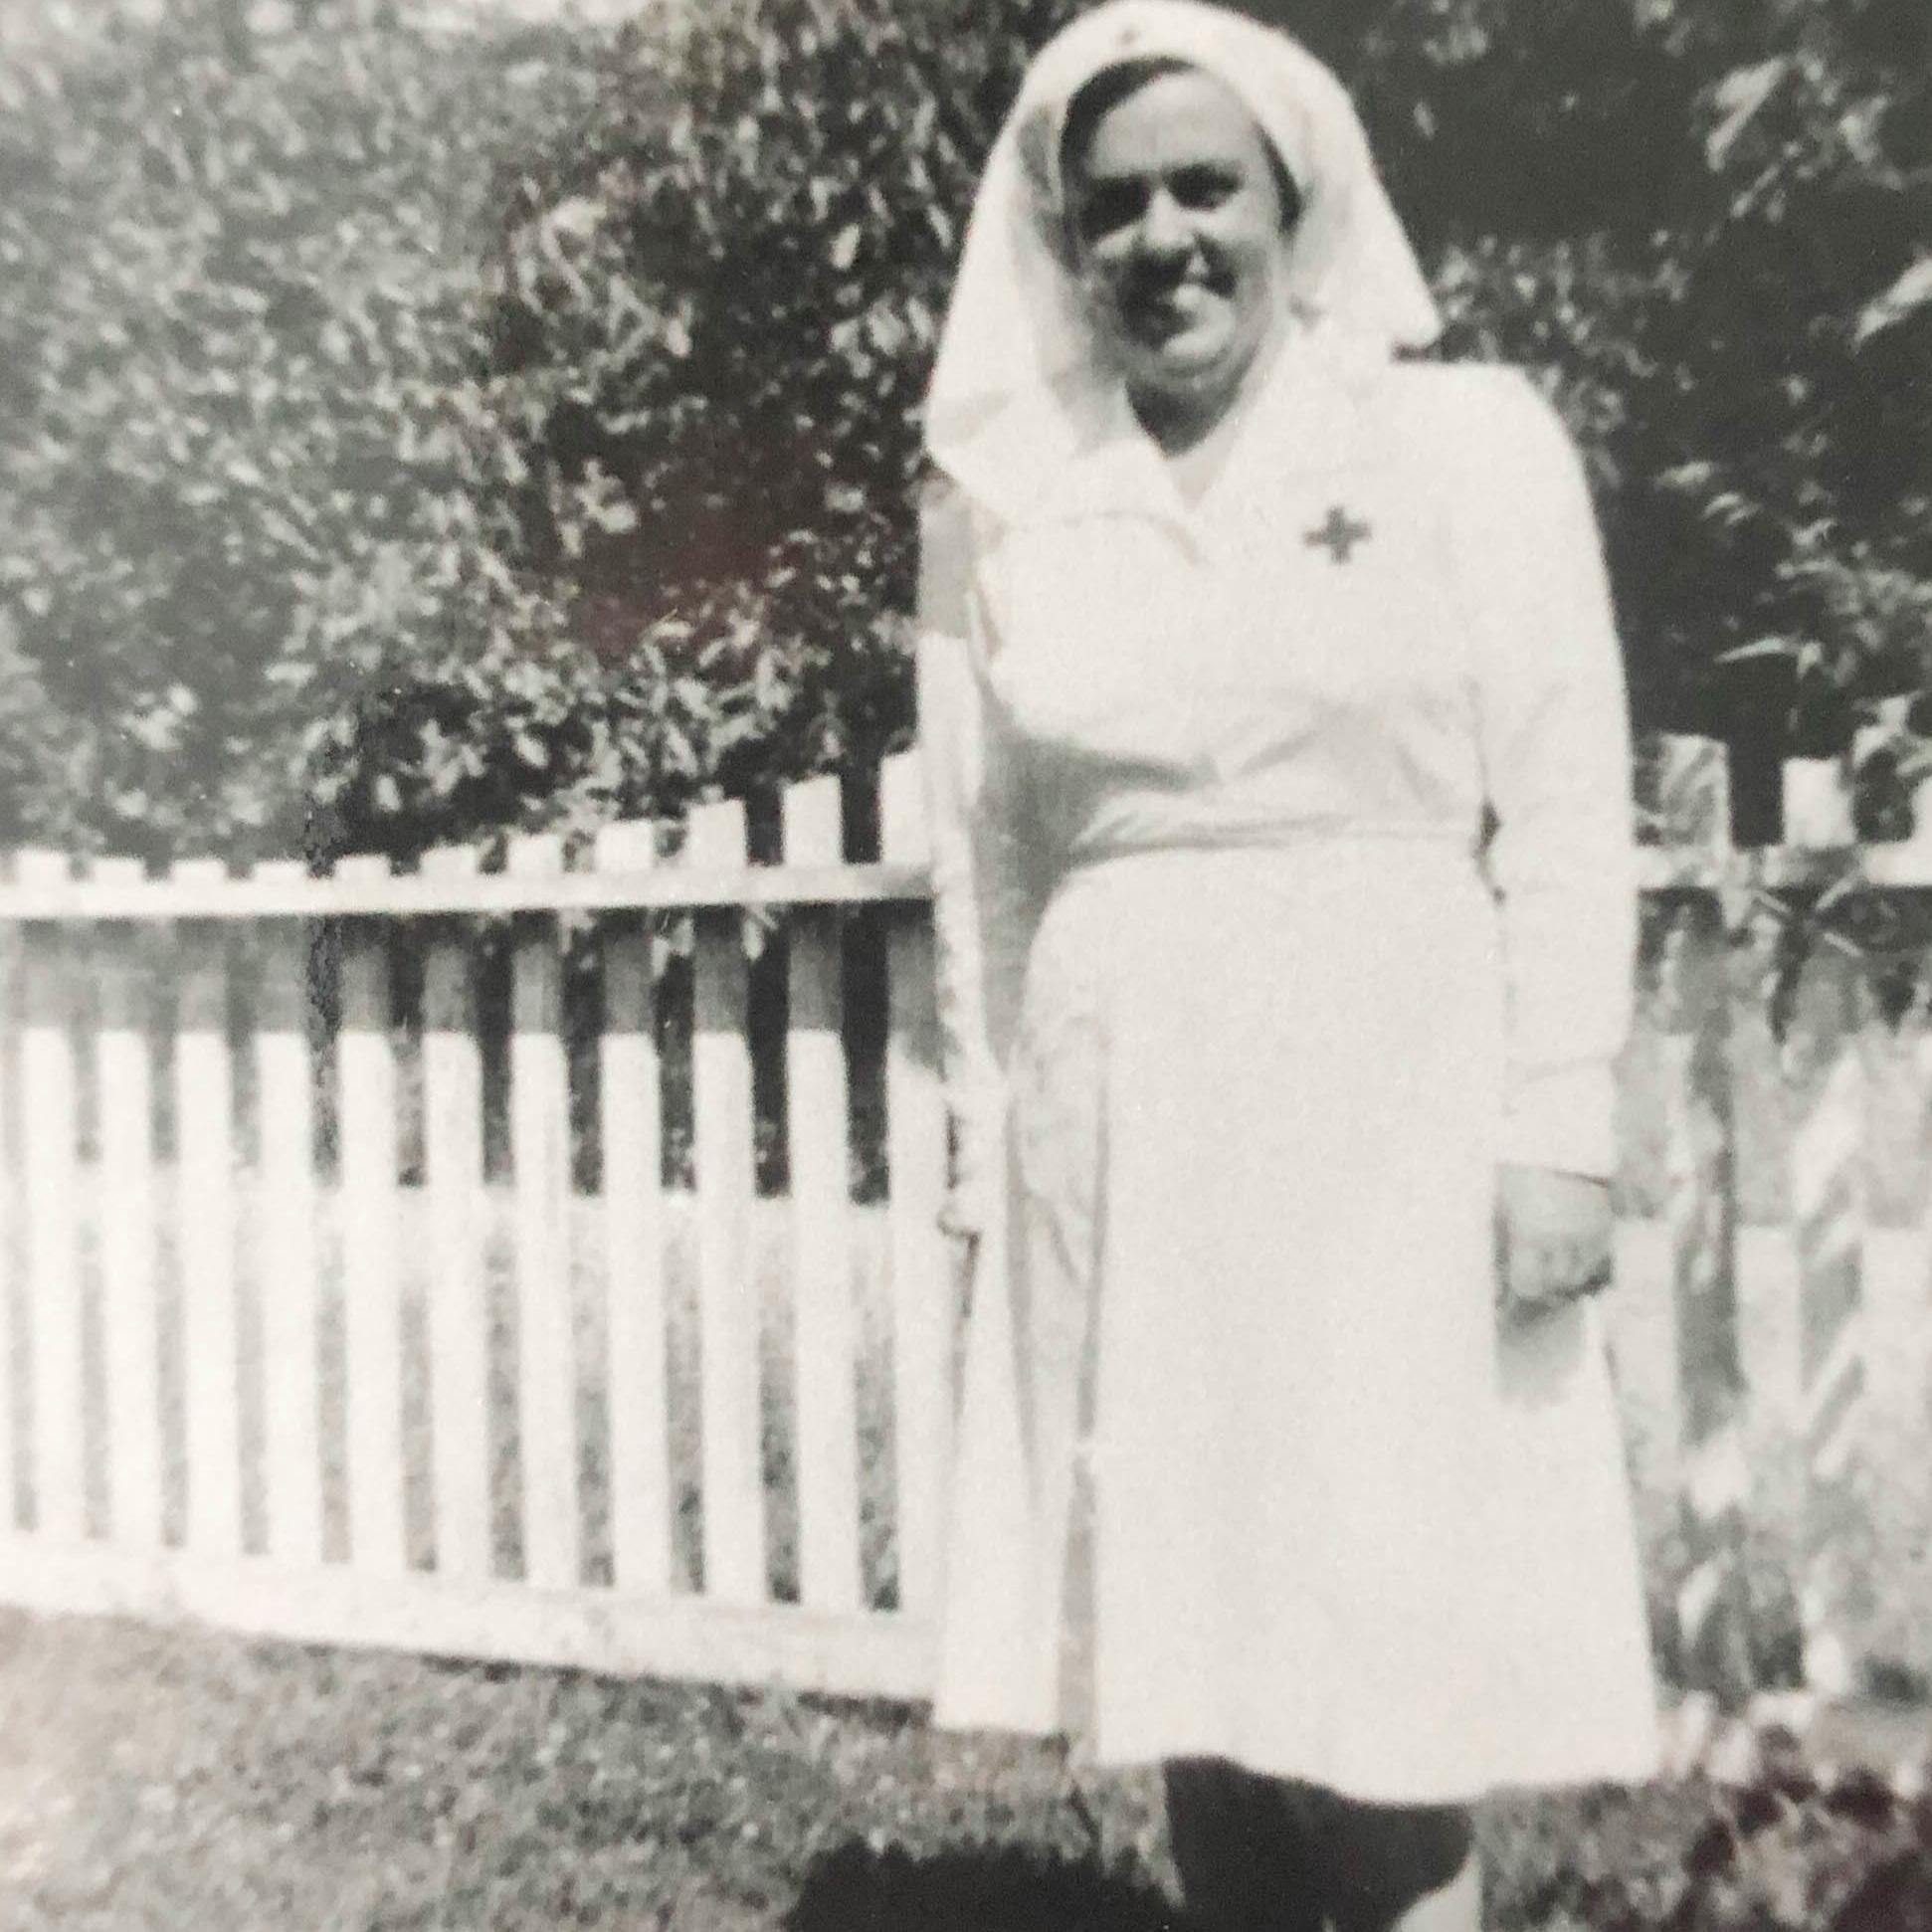 Doris Macomber in uniform